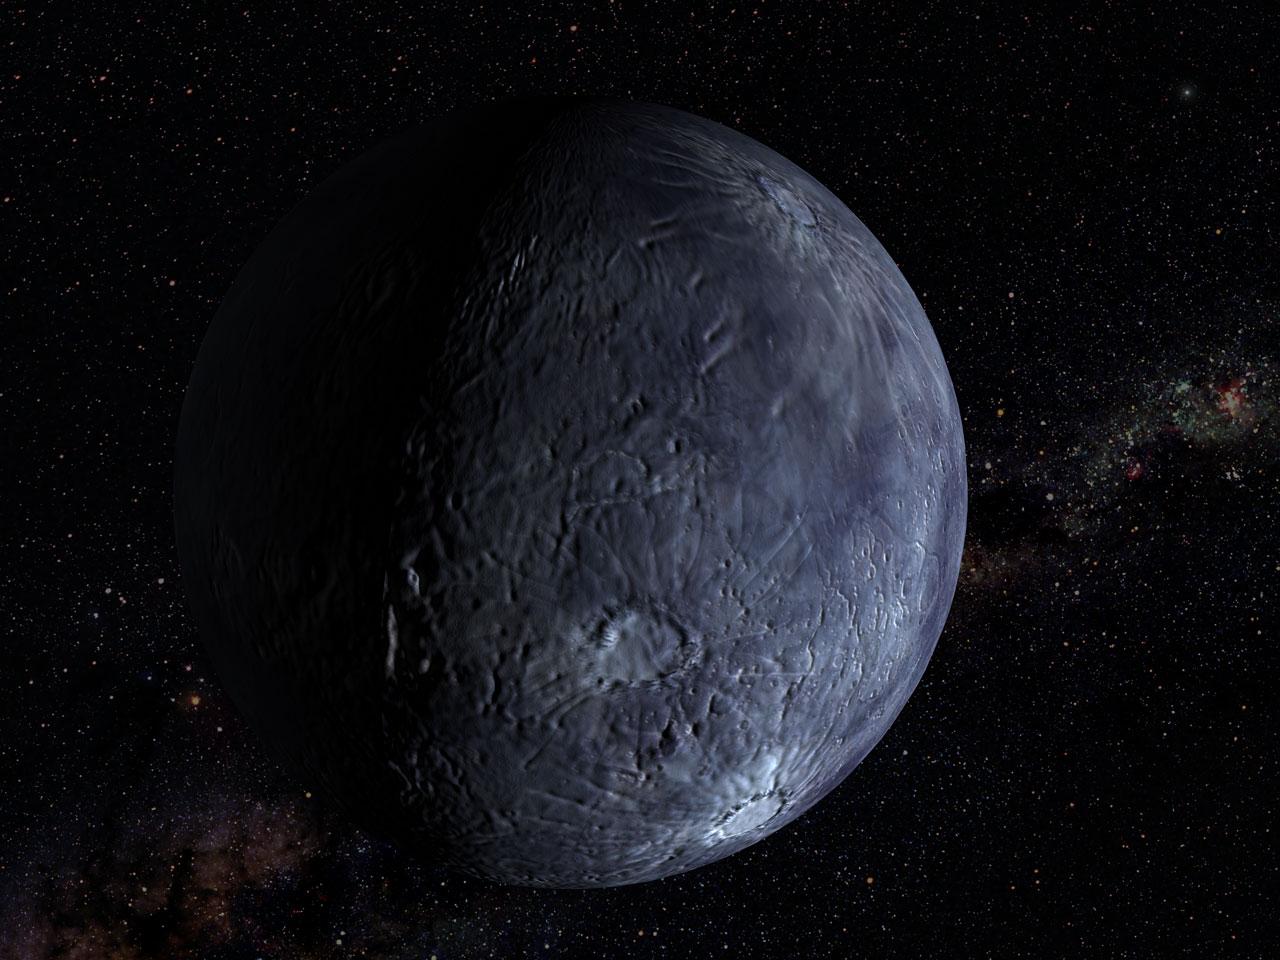 hubble telescope solar system - photo #23